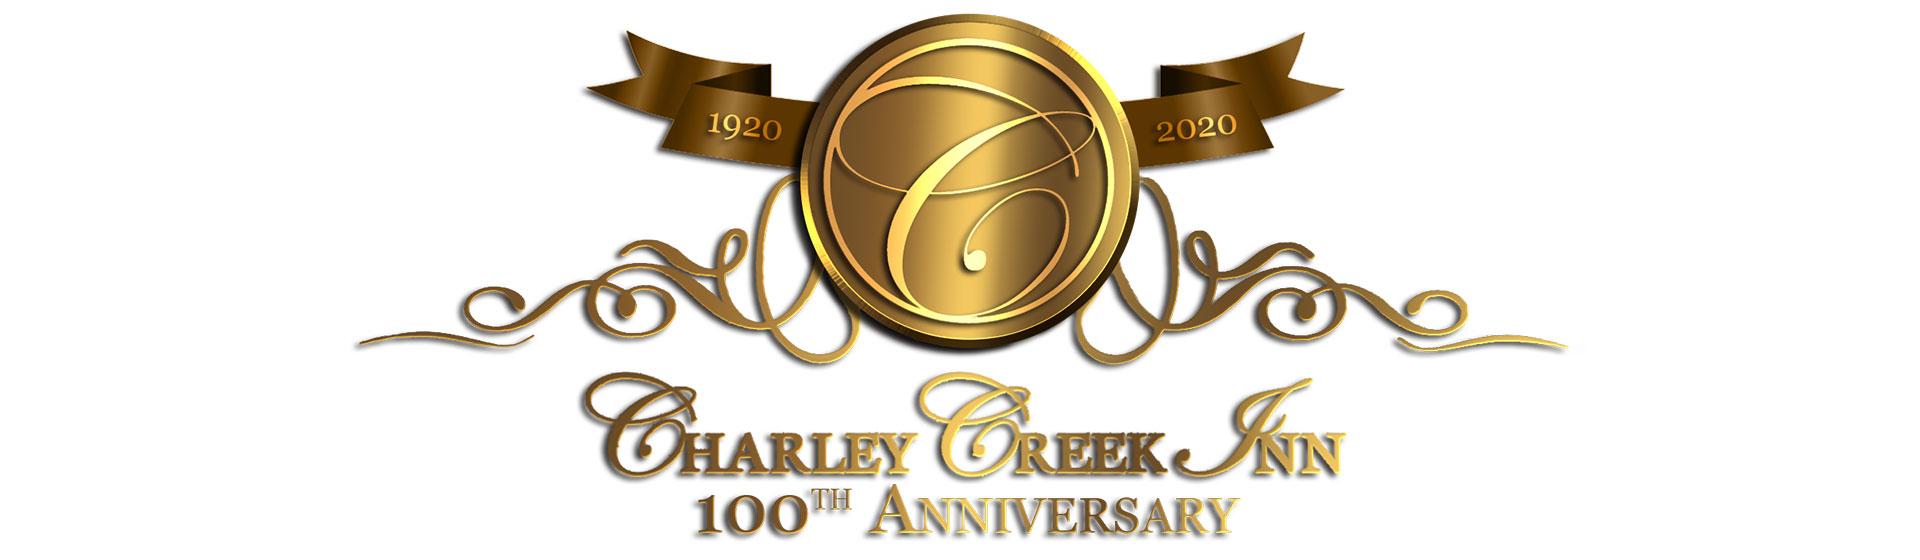 Charley Creek Inn 100th Anniversary